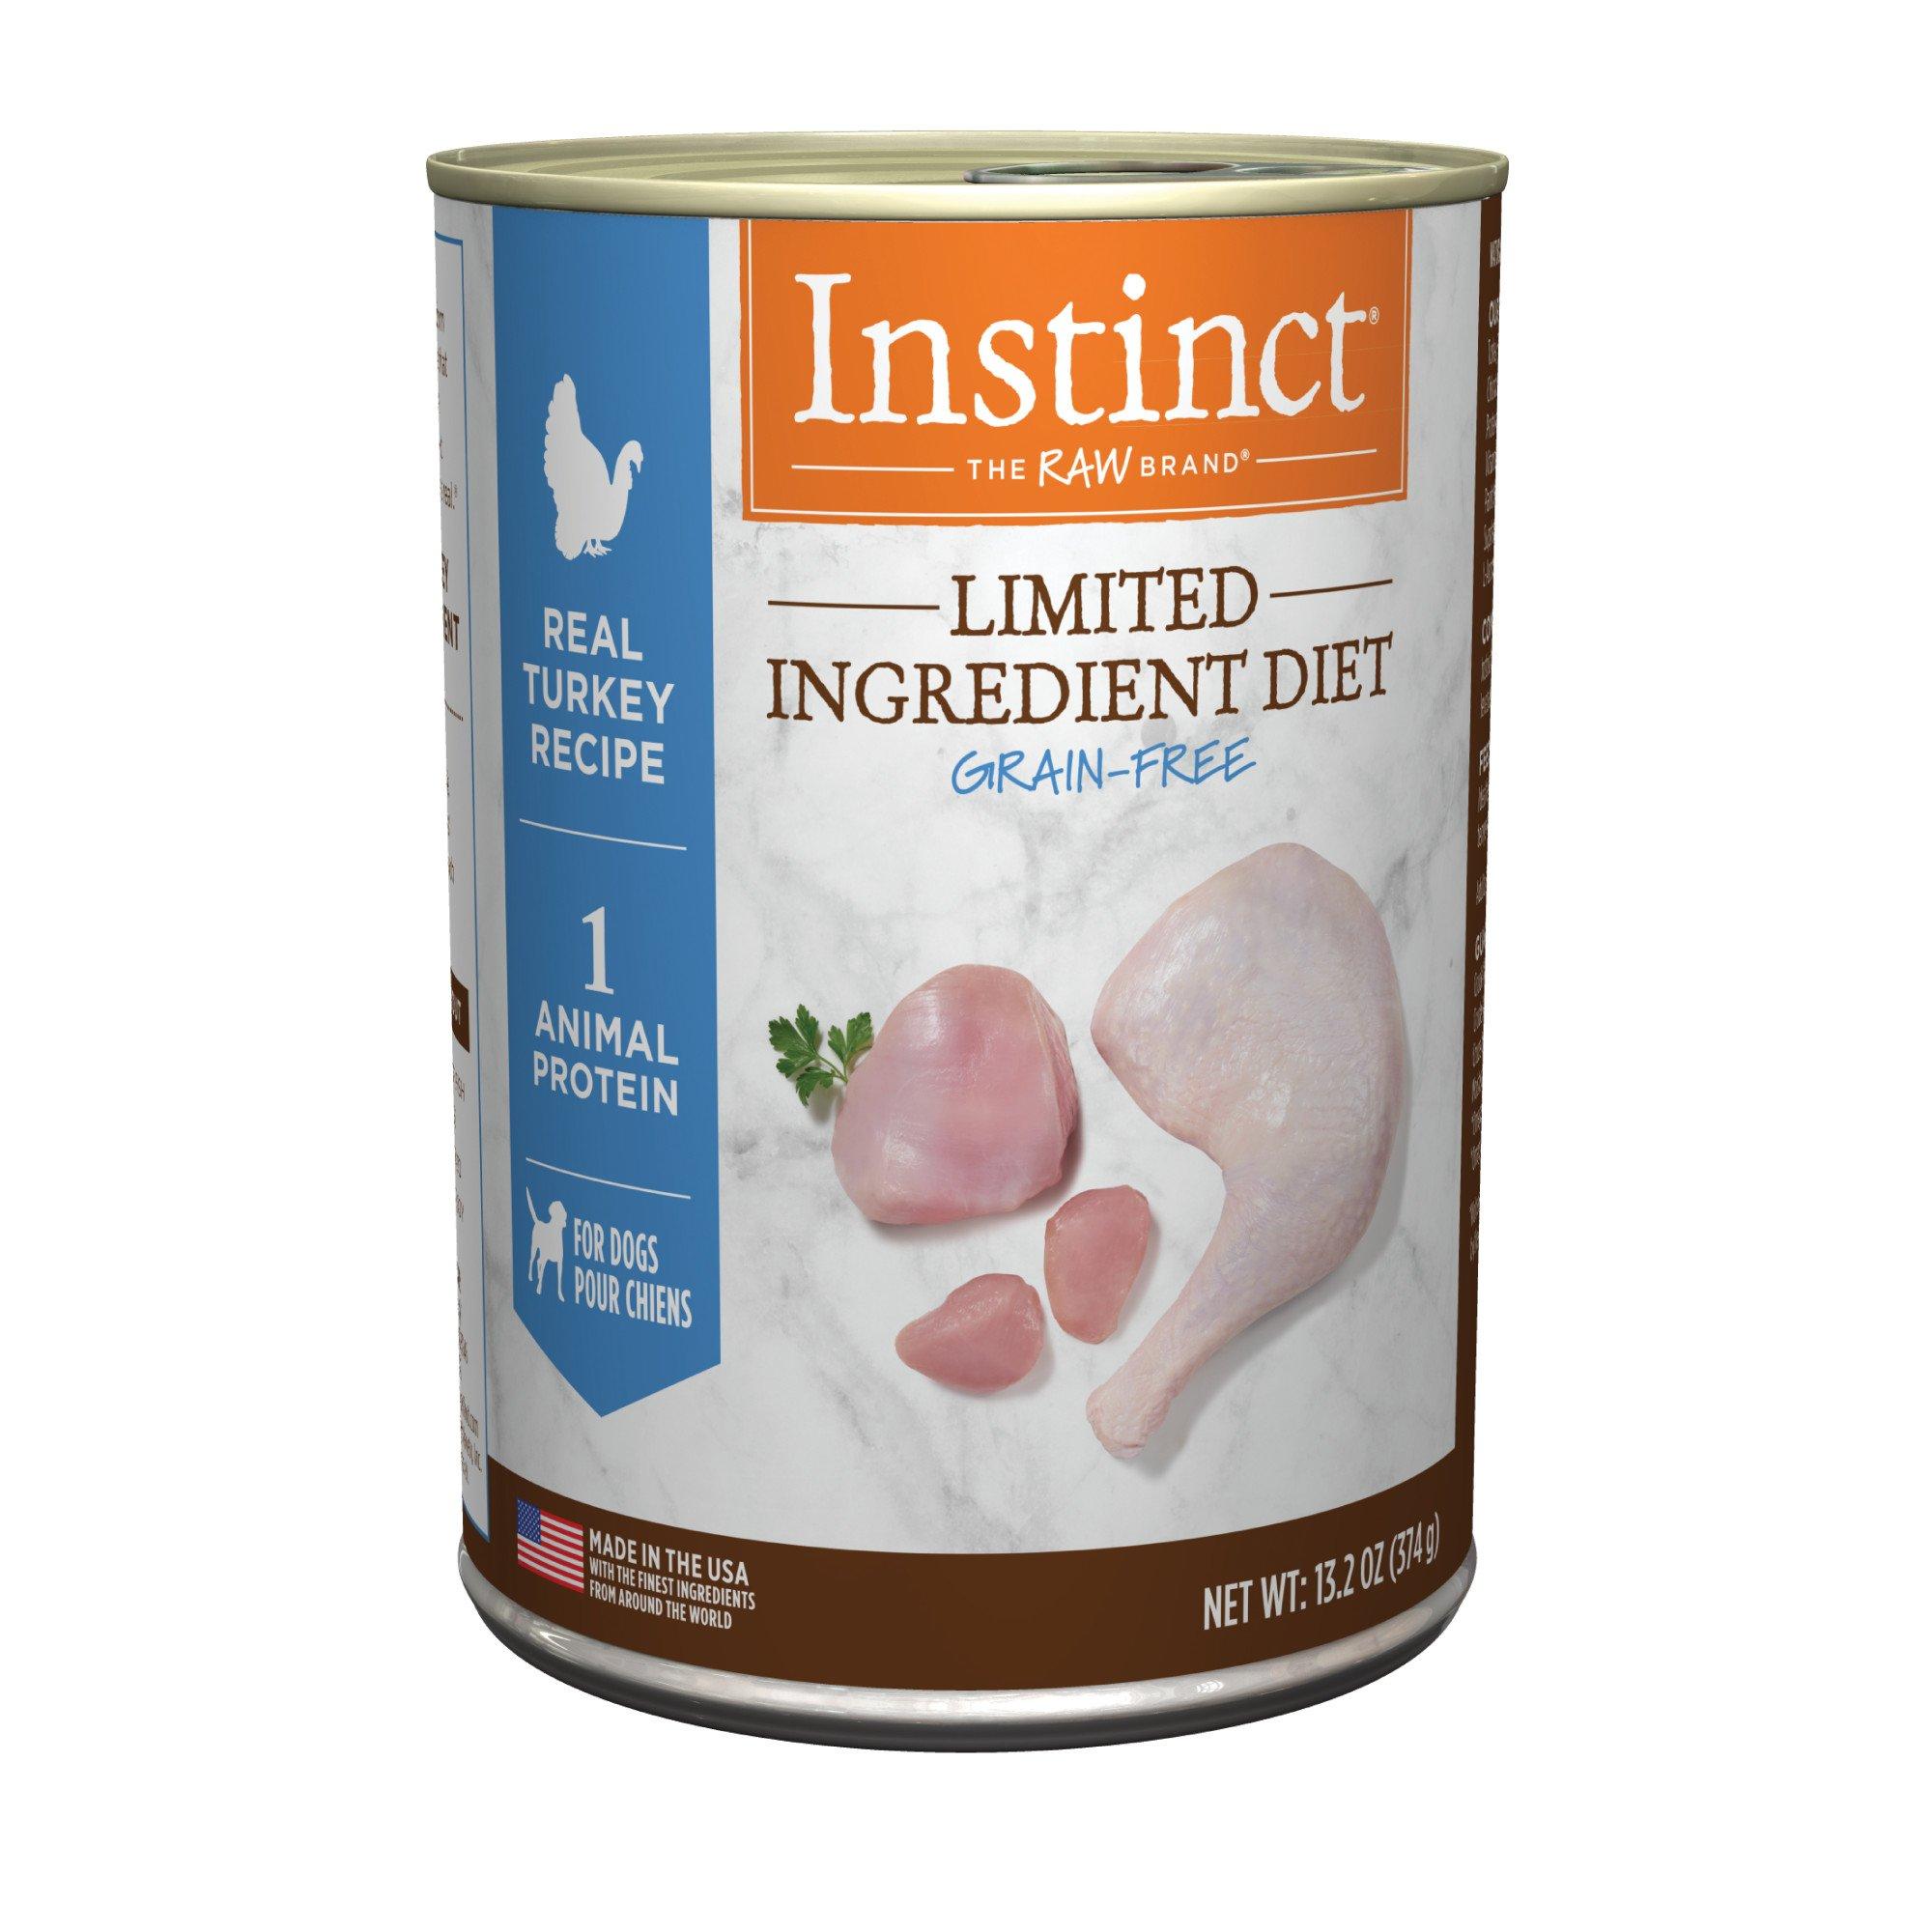 Nature's Variety Instinct Grain-Free Limited Ingredient Diet Turkey Canned Dog Food